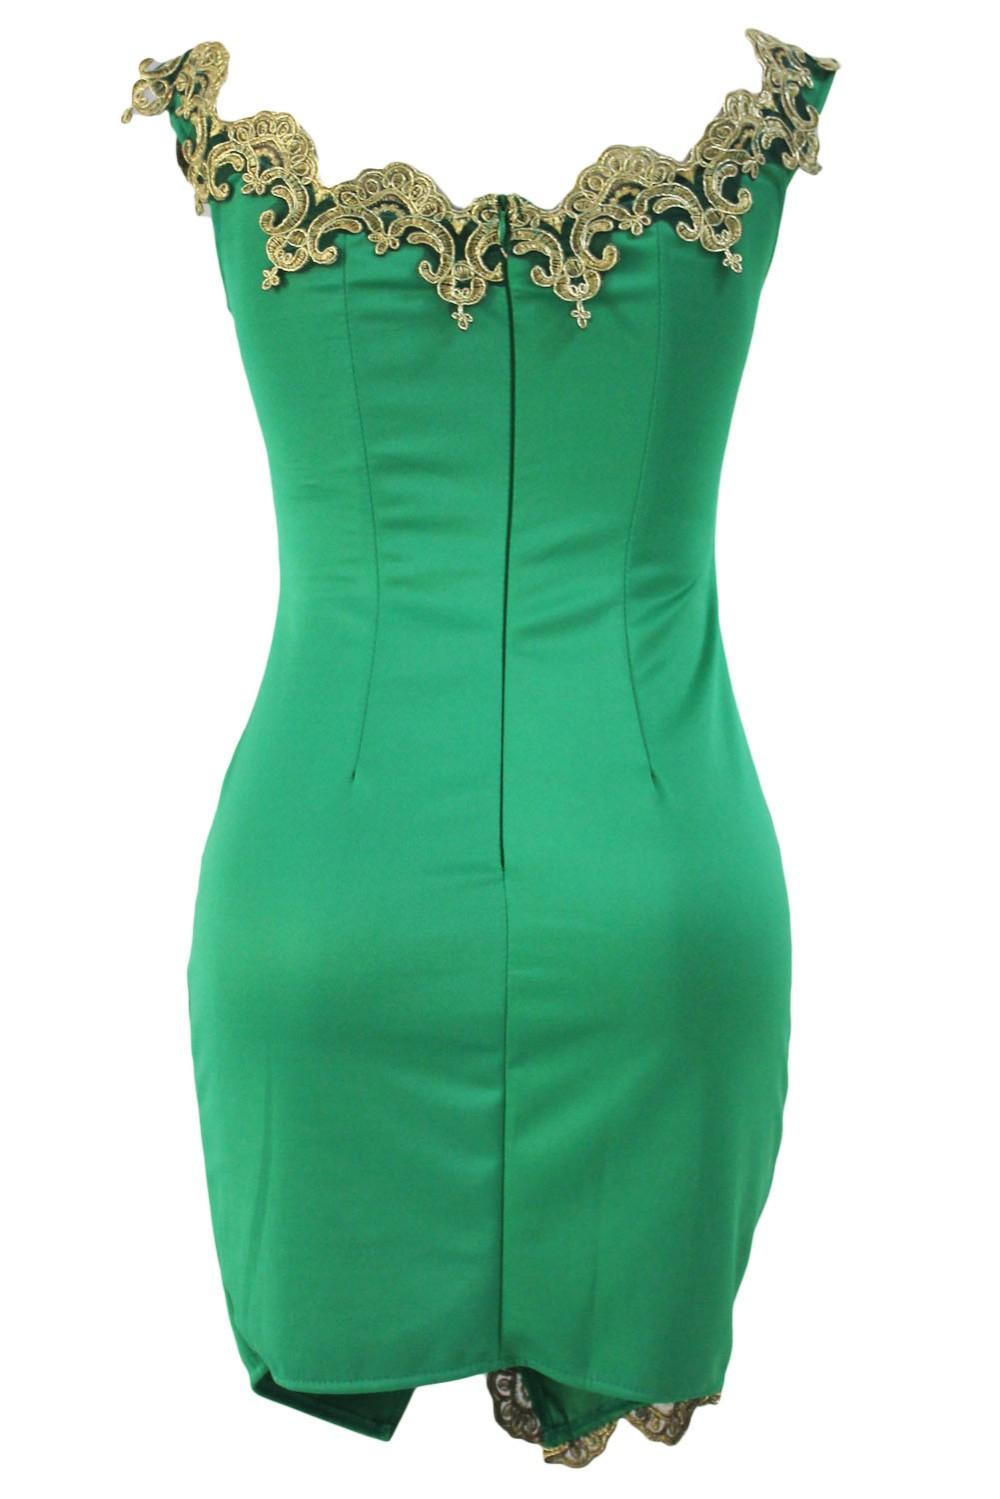 Gold-Lace-Applique-Green-Off-Shoulder-Mini-Dress-LC22715-9-4